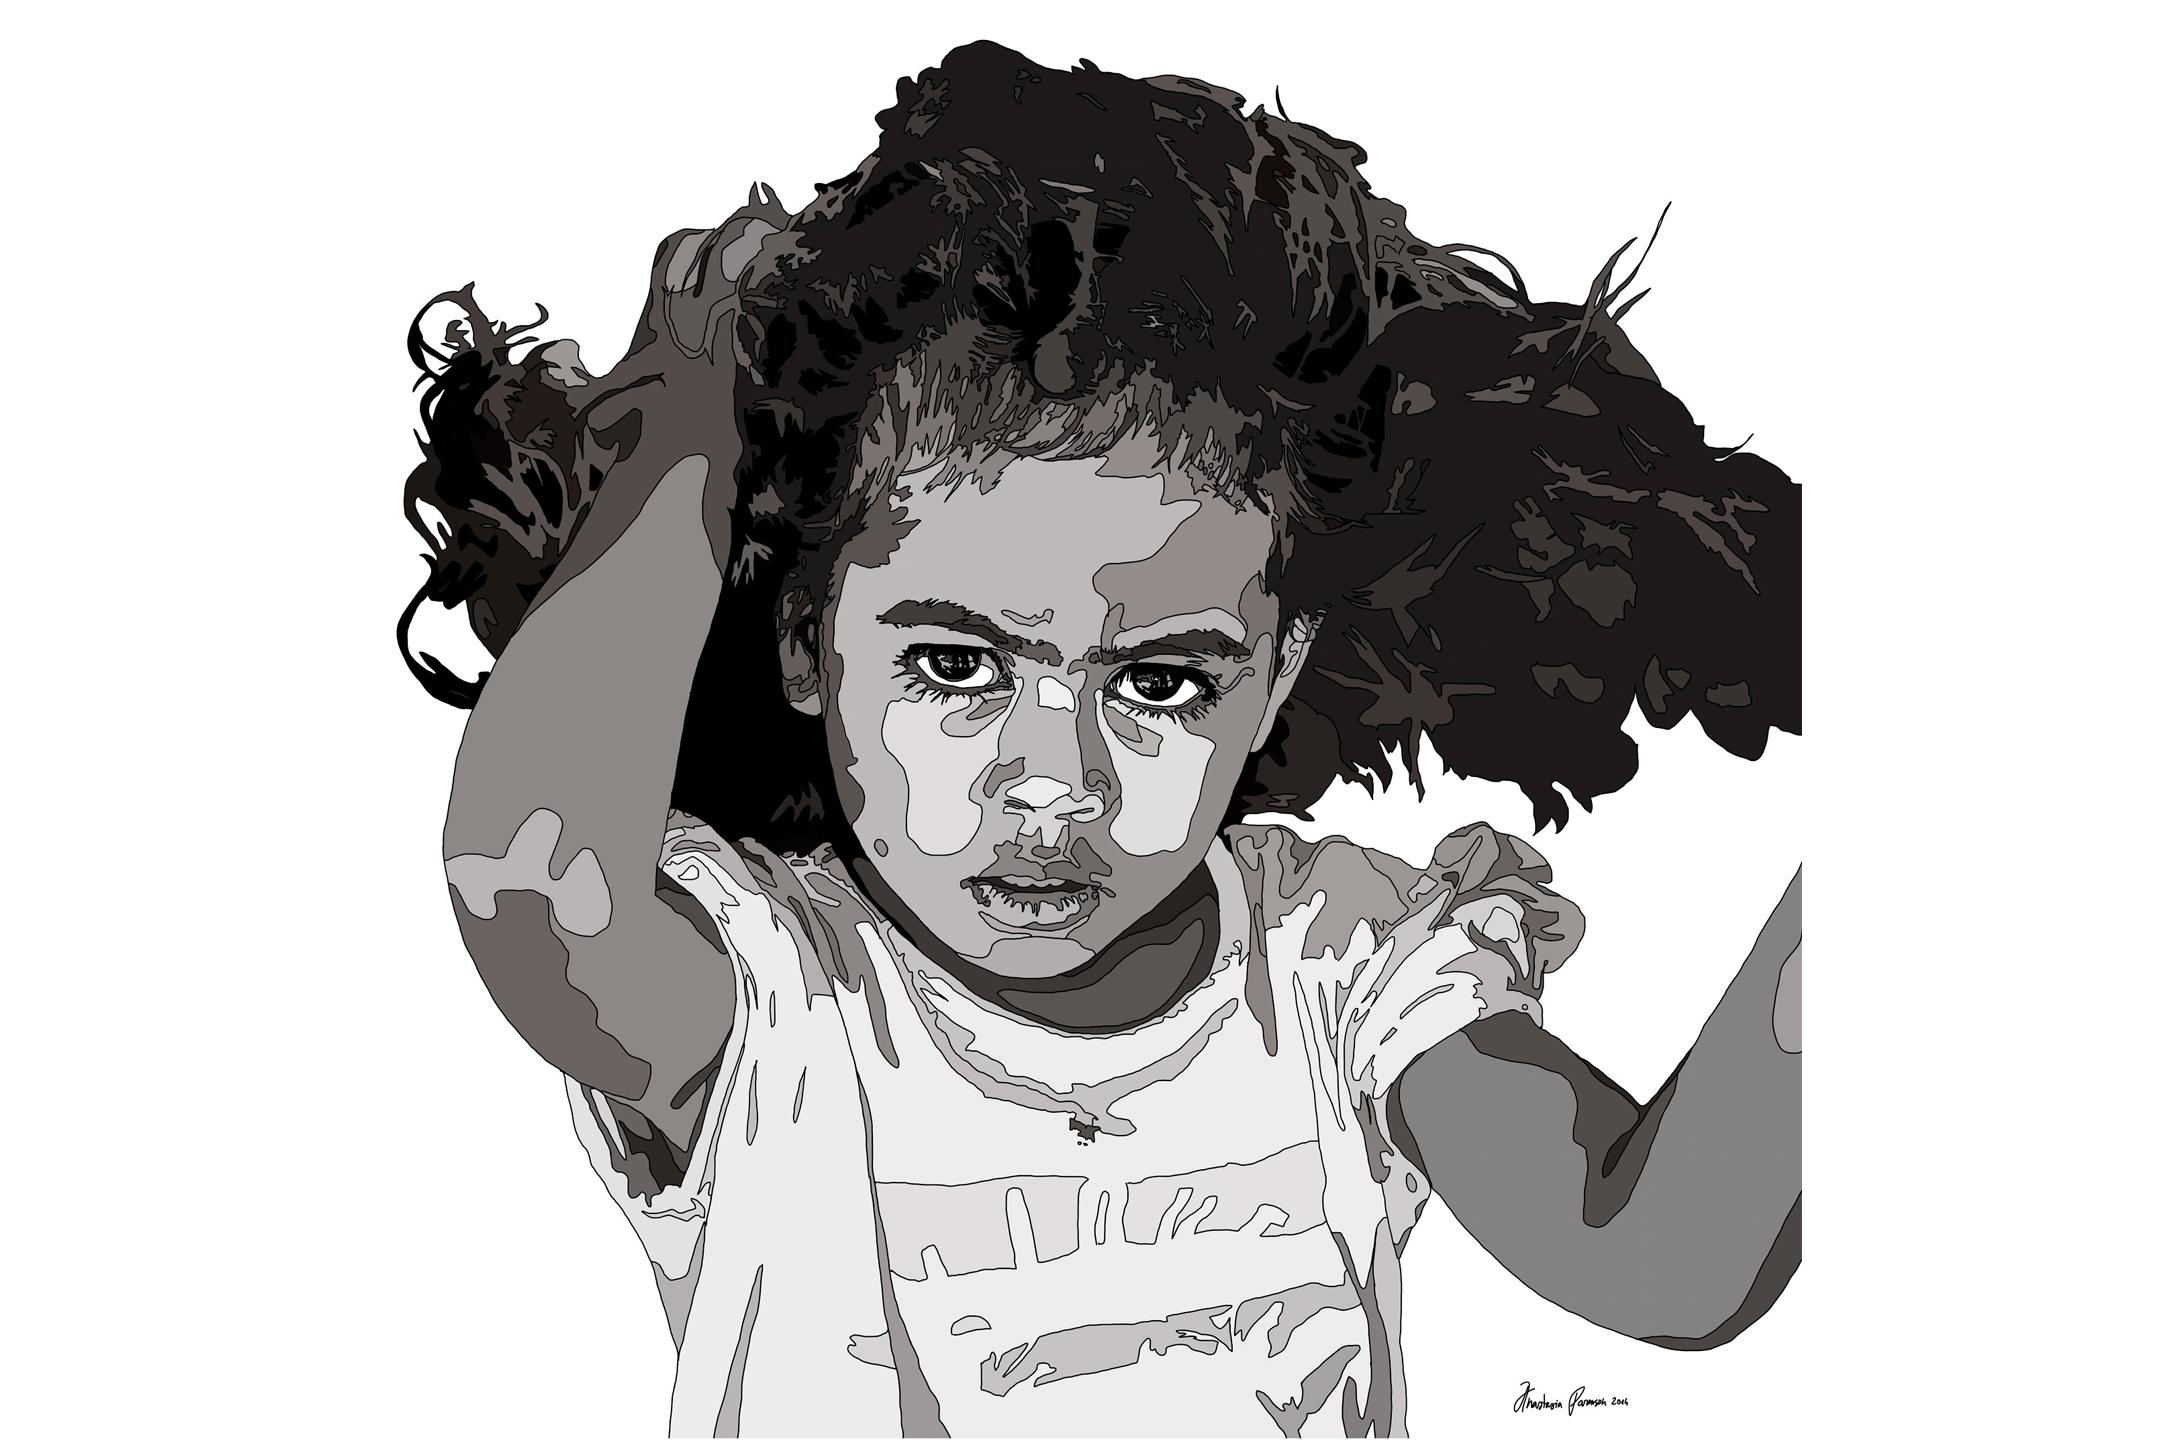 Untitled (Yasawa Girl) by Anastasia Parmson